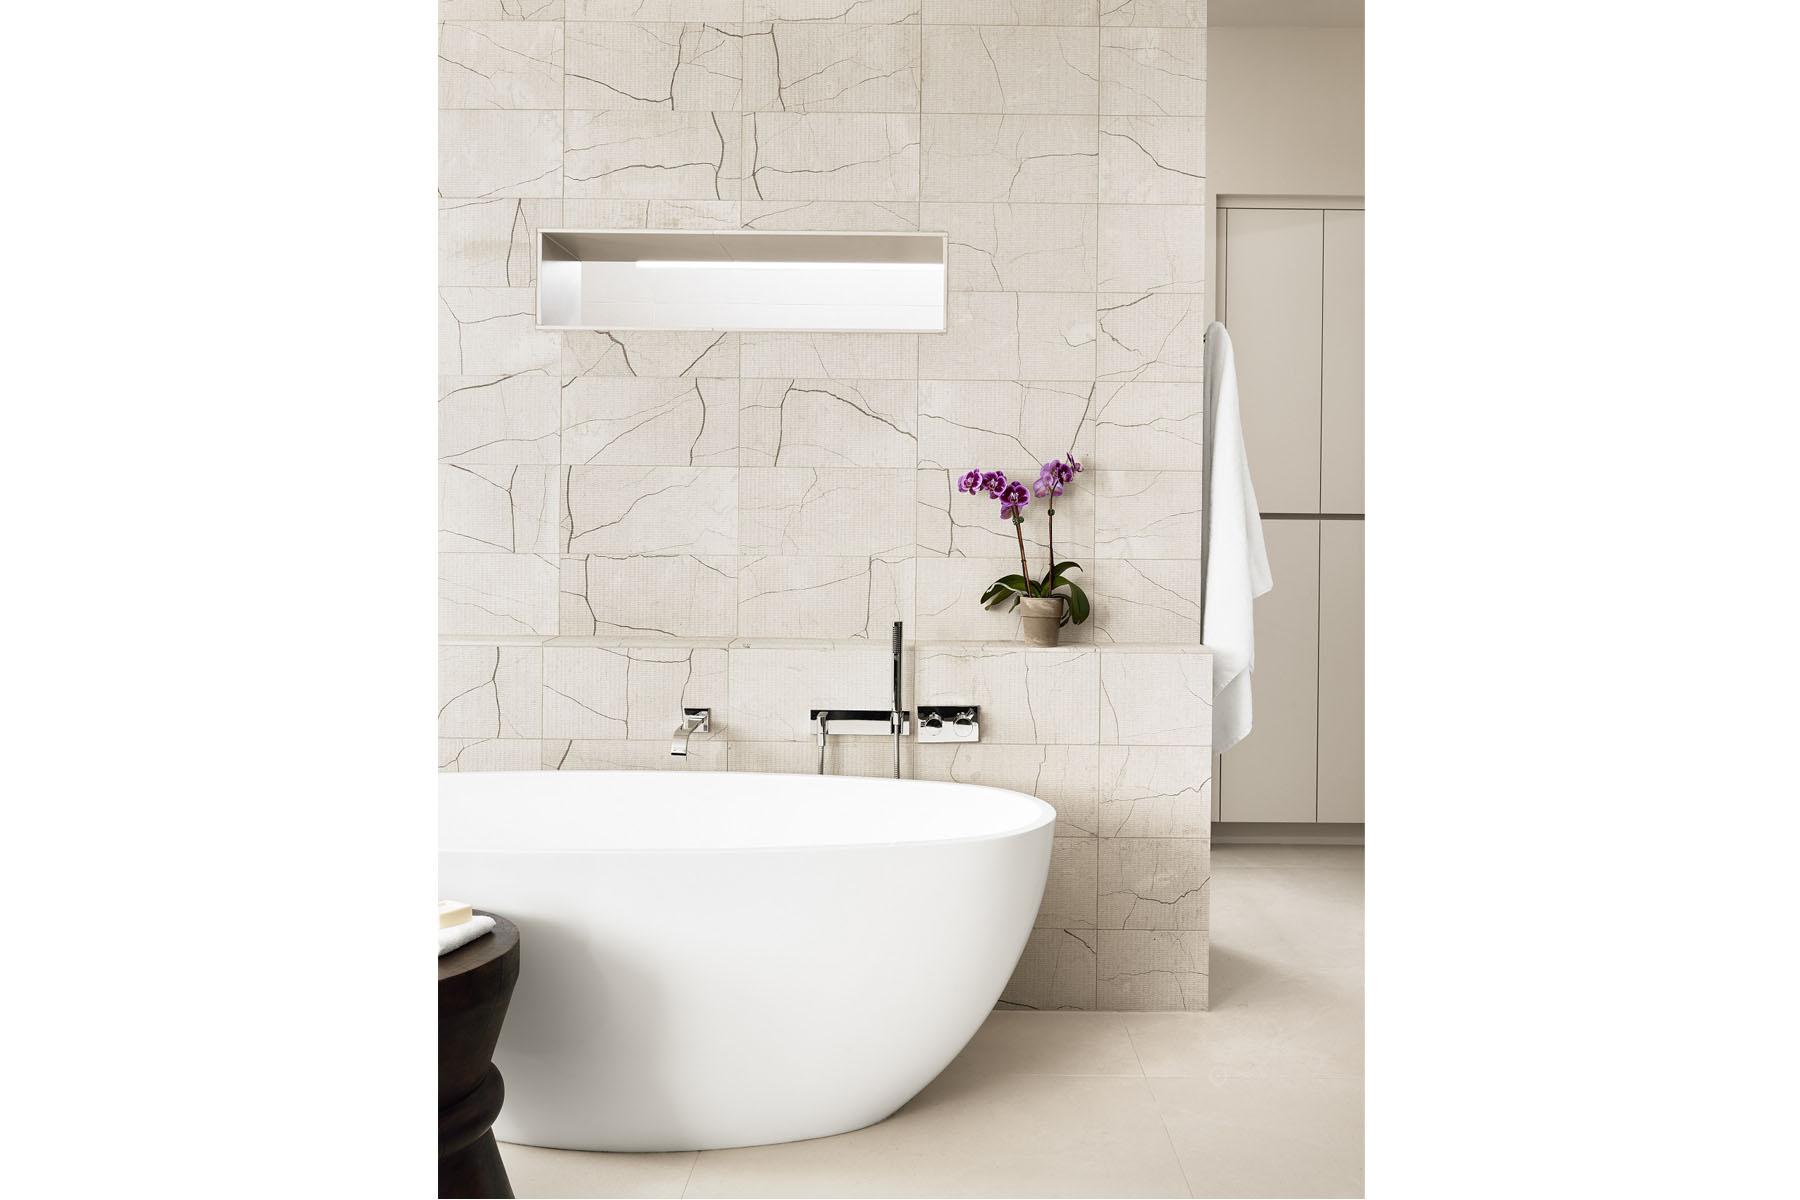 Rollingwood residence - master bath